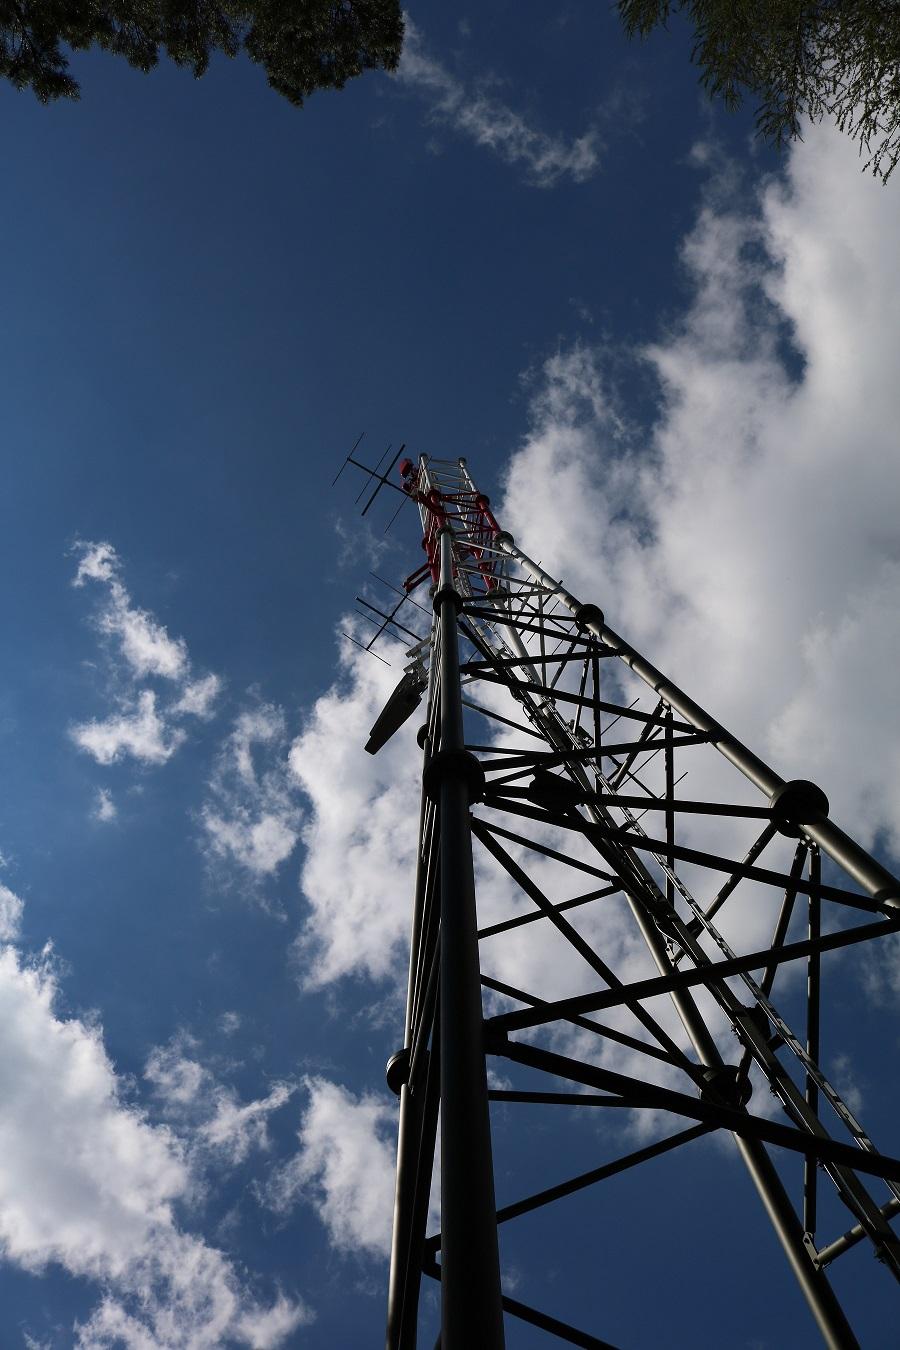 DVB-T2 und Radiosender Aspang am Königsberg Mast